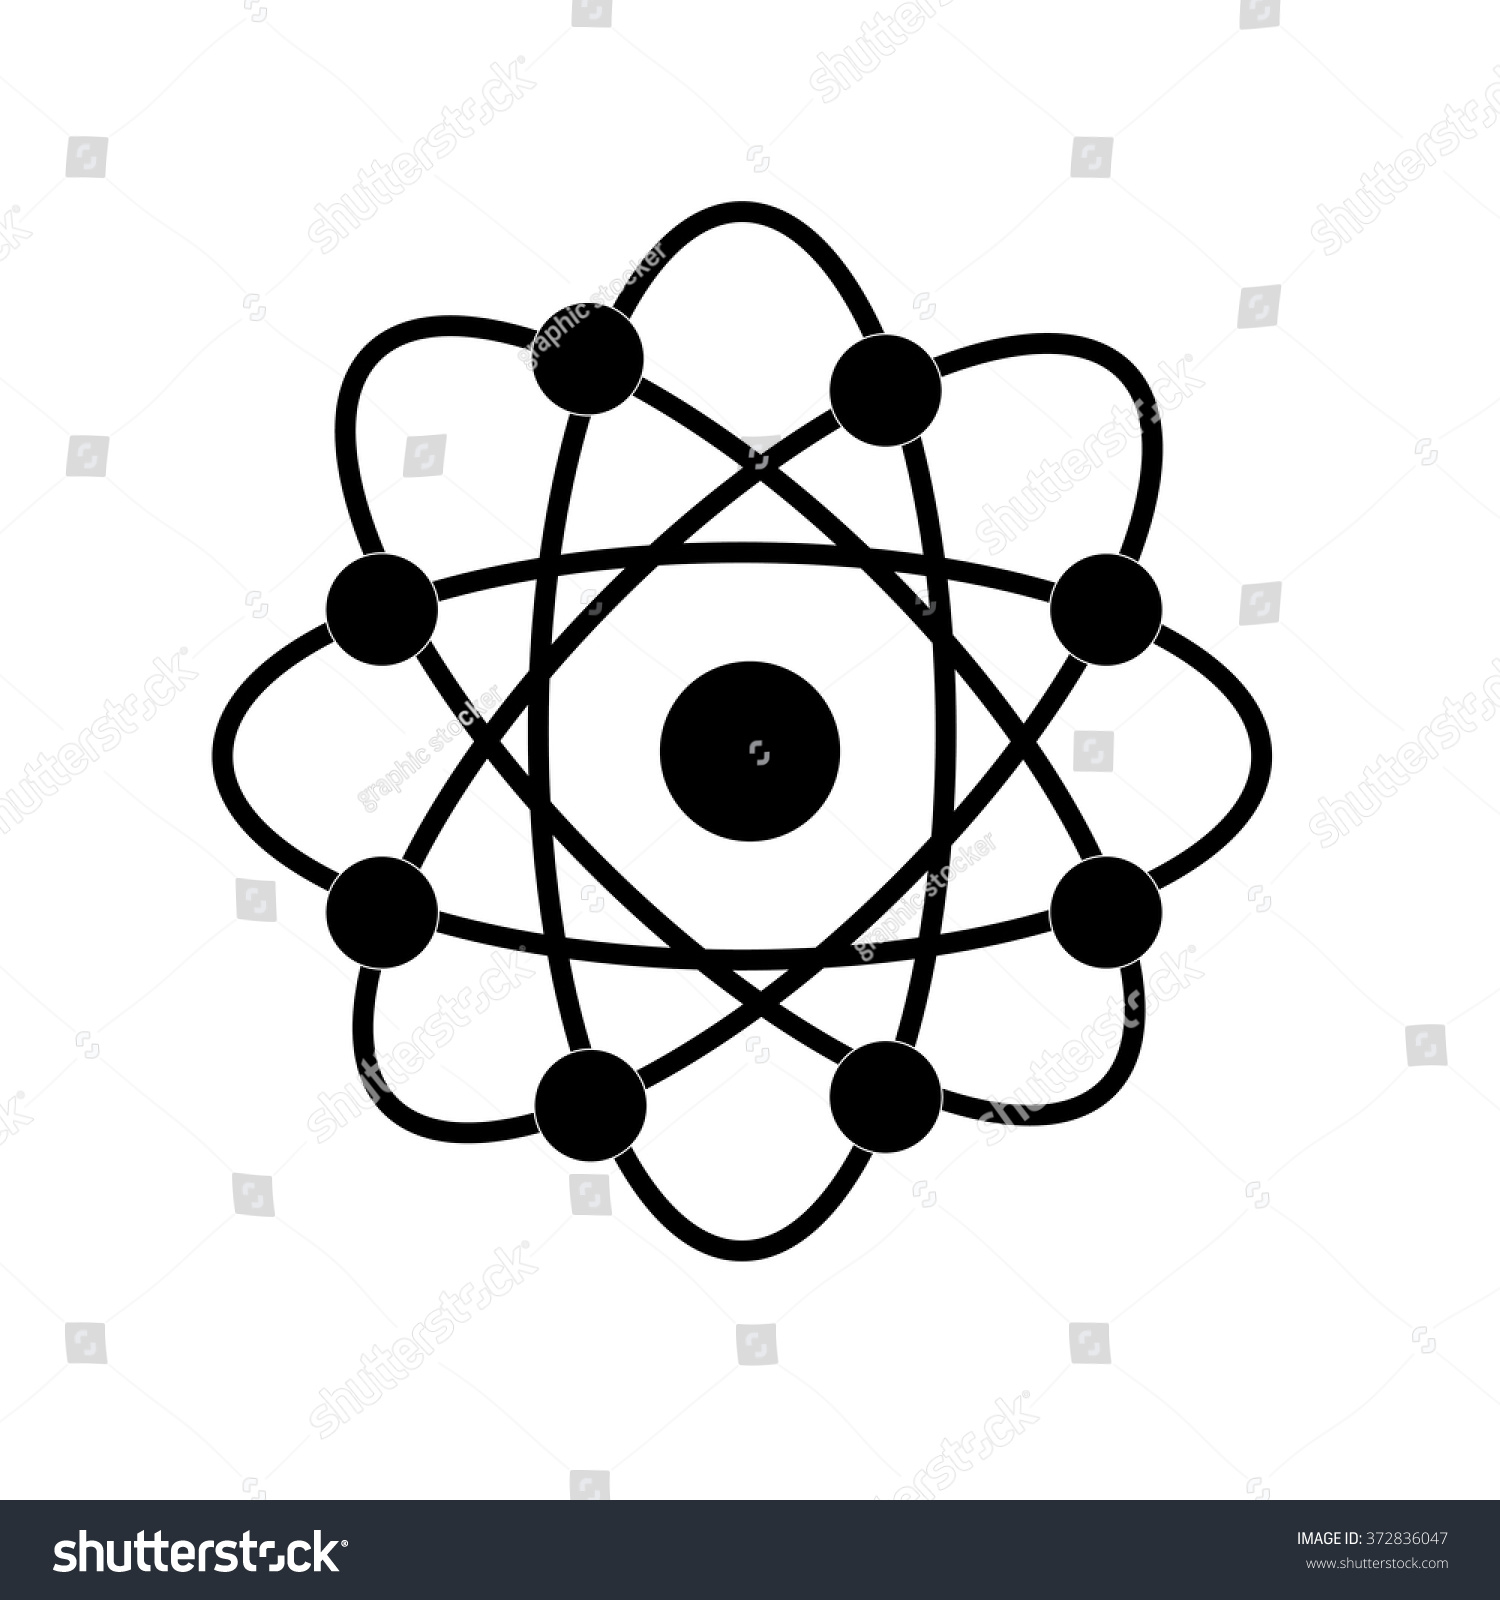 Atom structure vectorsymbol atomatom atom illustrationcovalent stock atom structure vectorsymbol of atomatom atom illustrationcovalent shell of ccuart Images